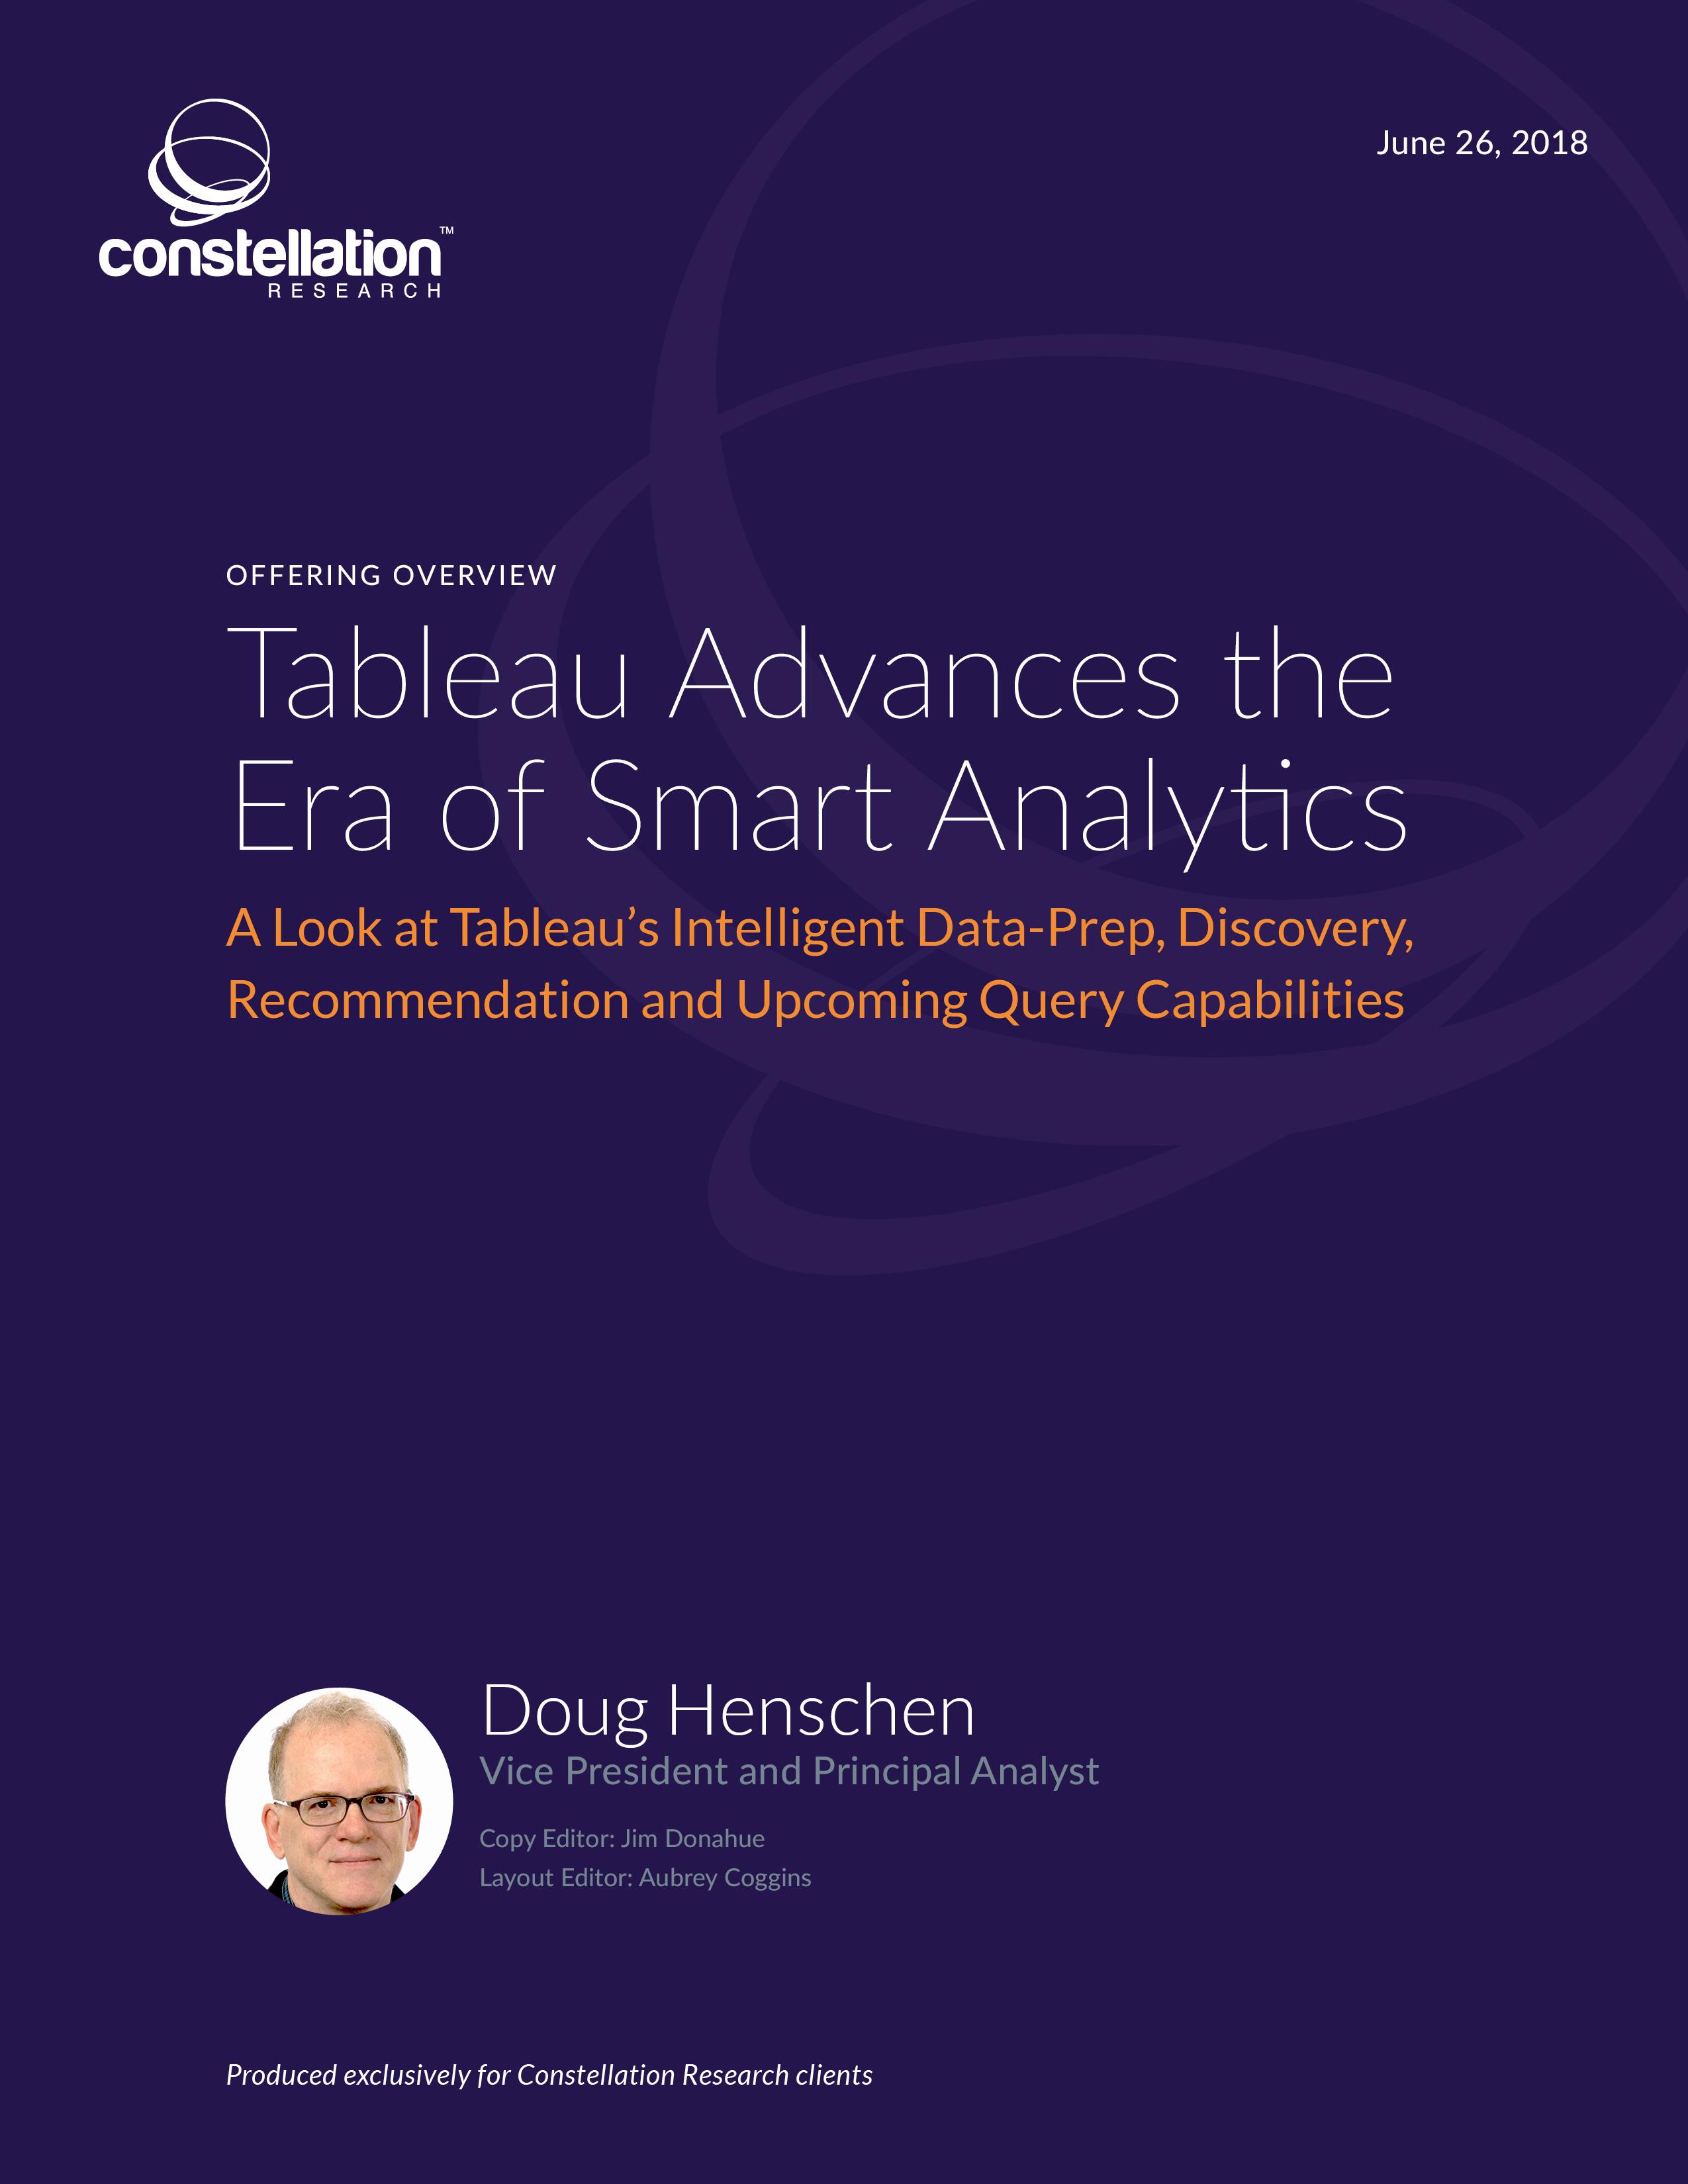 Tableau Advances the Era of Smart Analytics